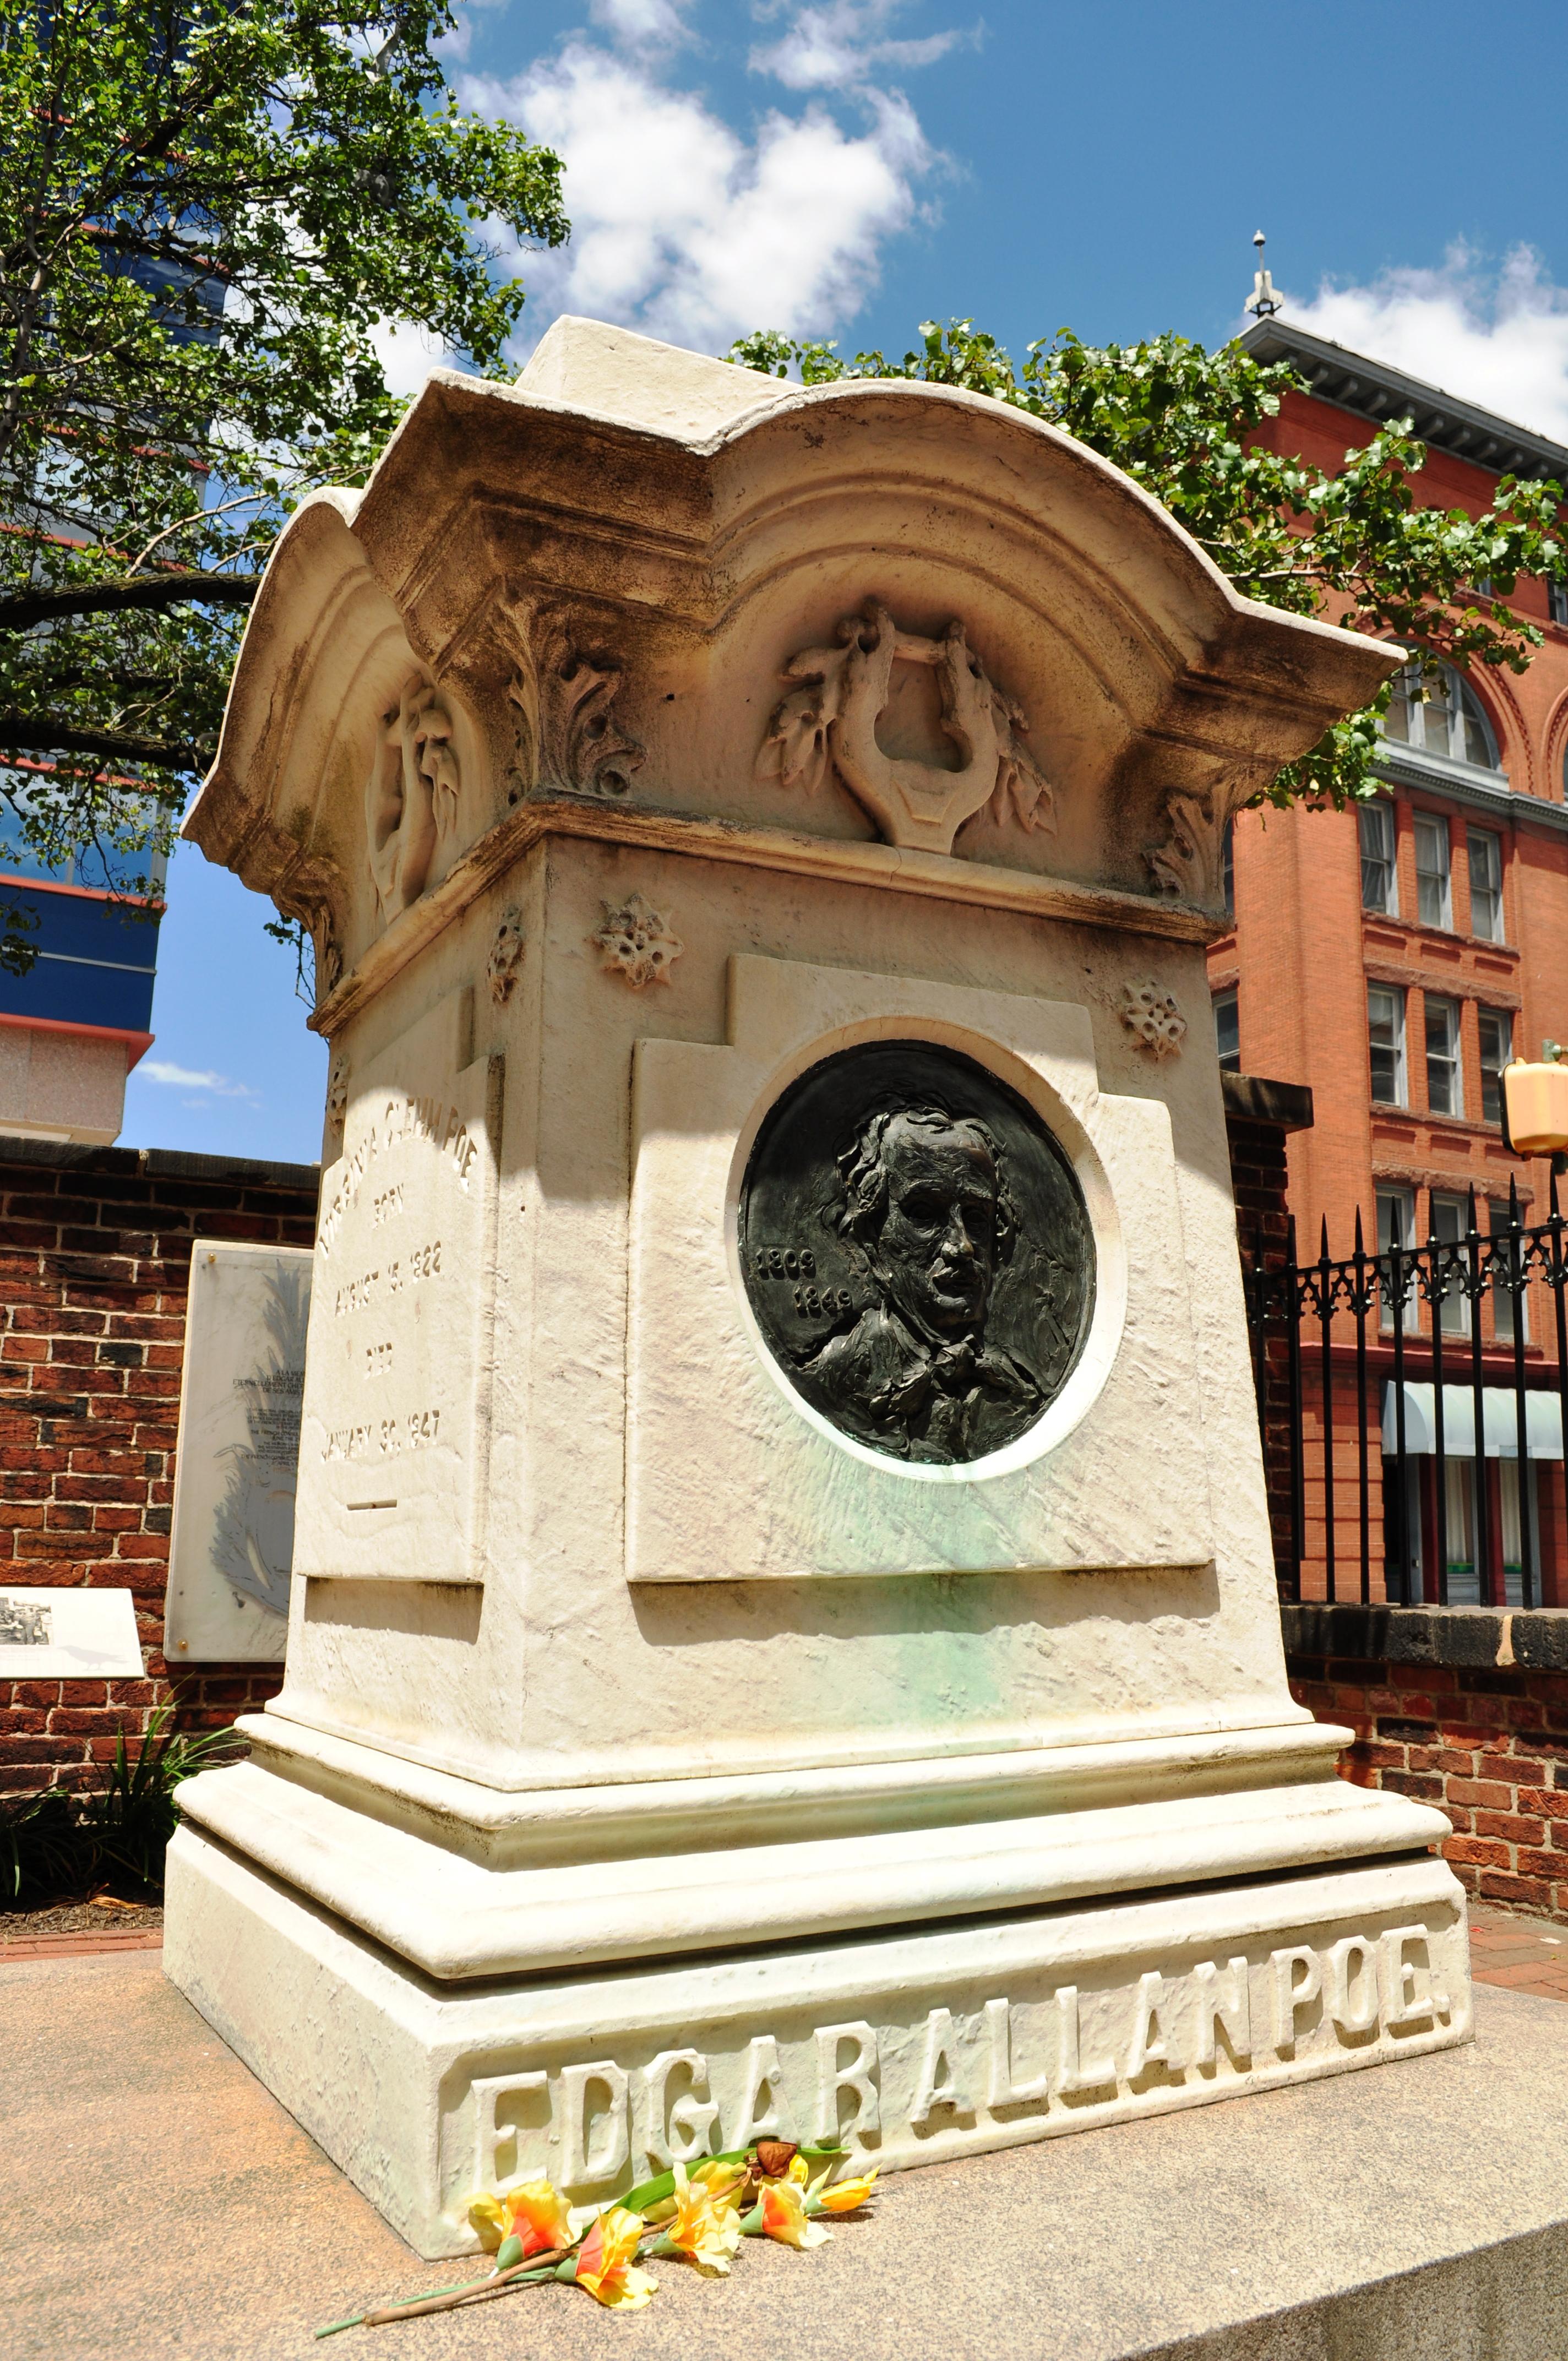 http://upload.wikimedia.org/wikipedia/commons/b/bf/EdgarAllanPoeGrave.jpg